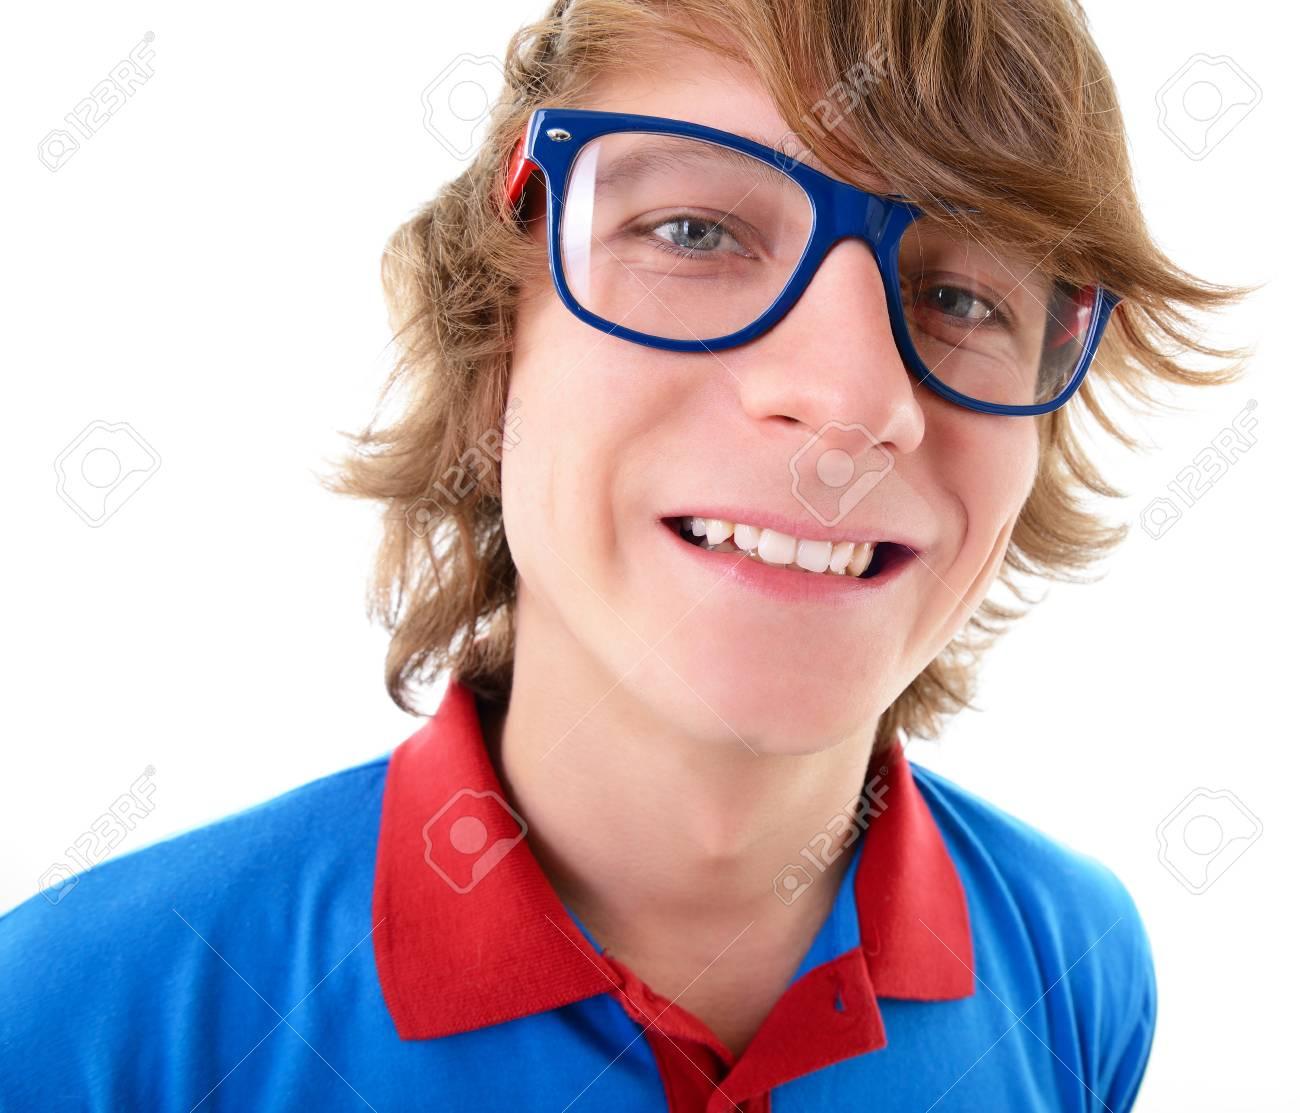 Hombre Sonriente Gracioso ModaMás Sol Con De Joven Gafas YbmIf7gy6v